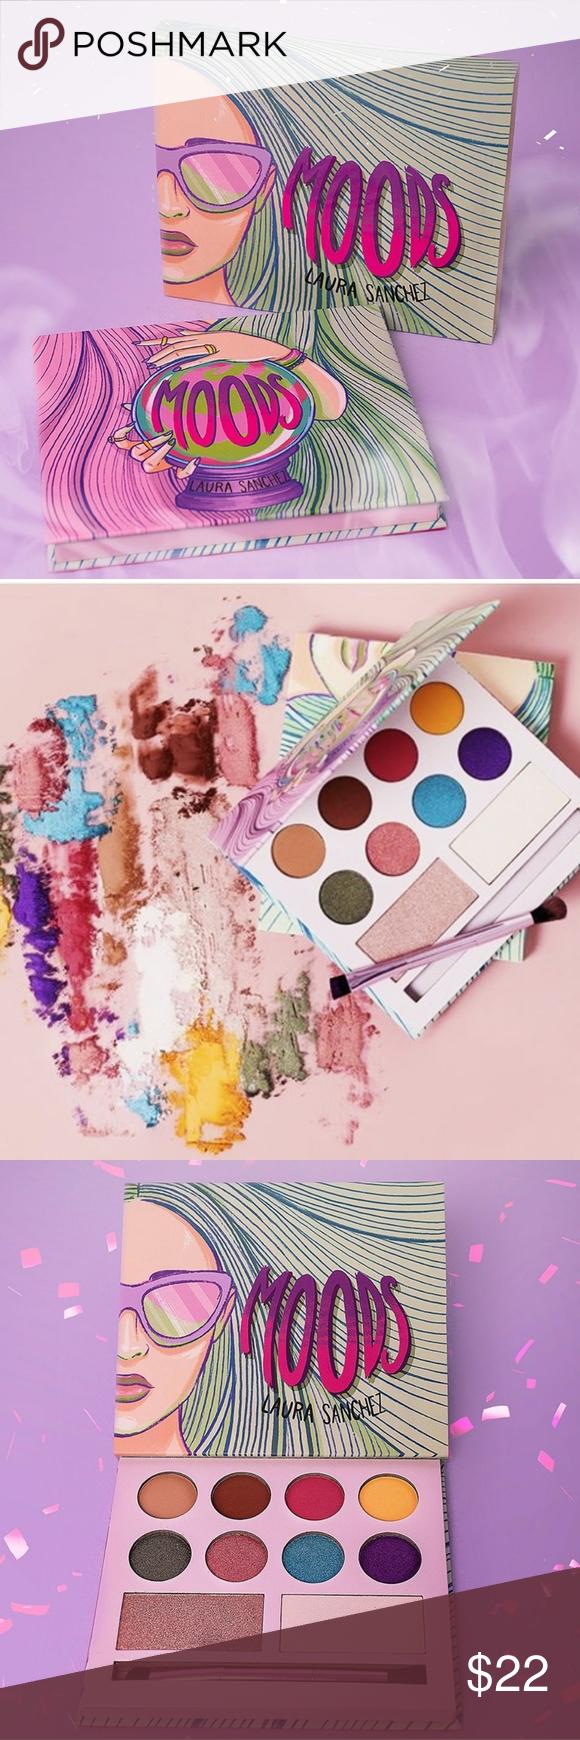 Laura Sanchez Moods Eyeshadow Highlighter Palette NWT